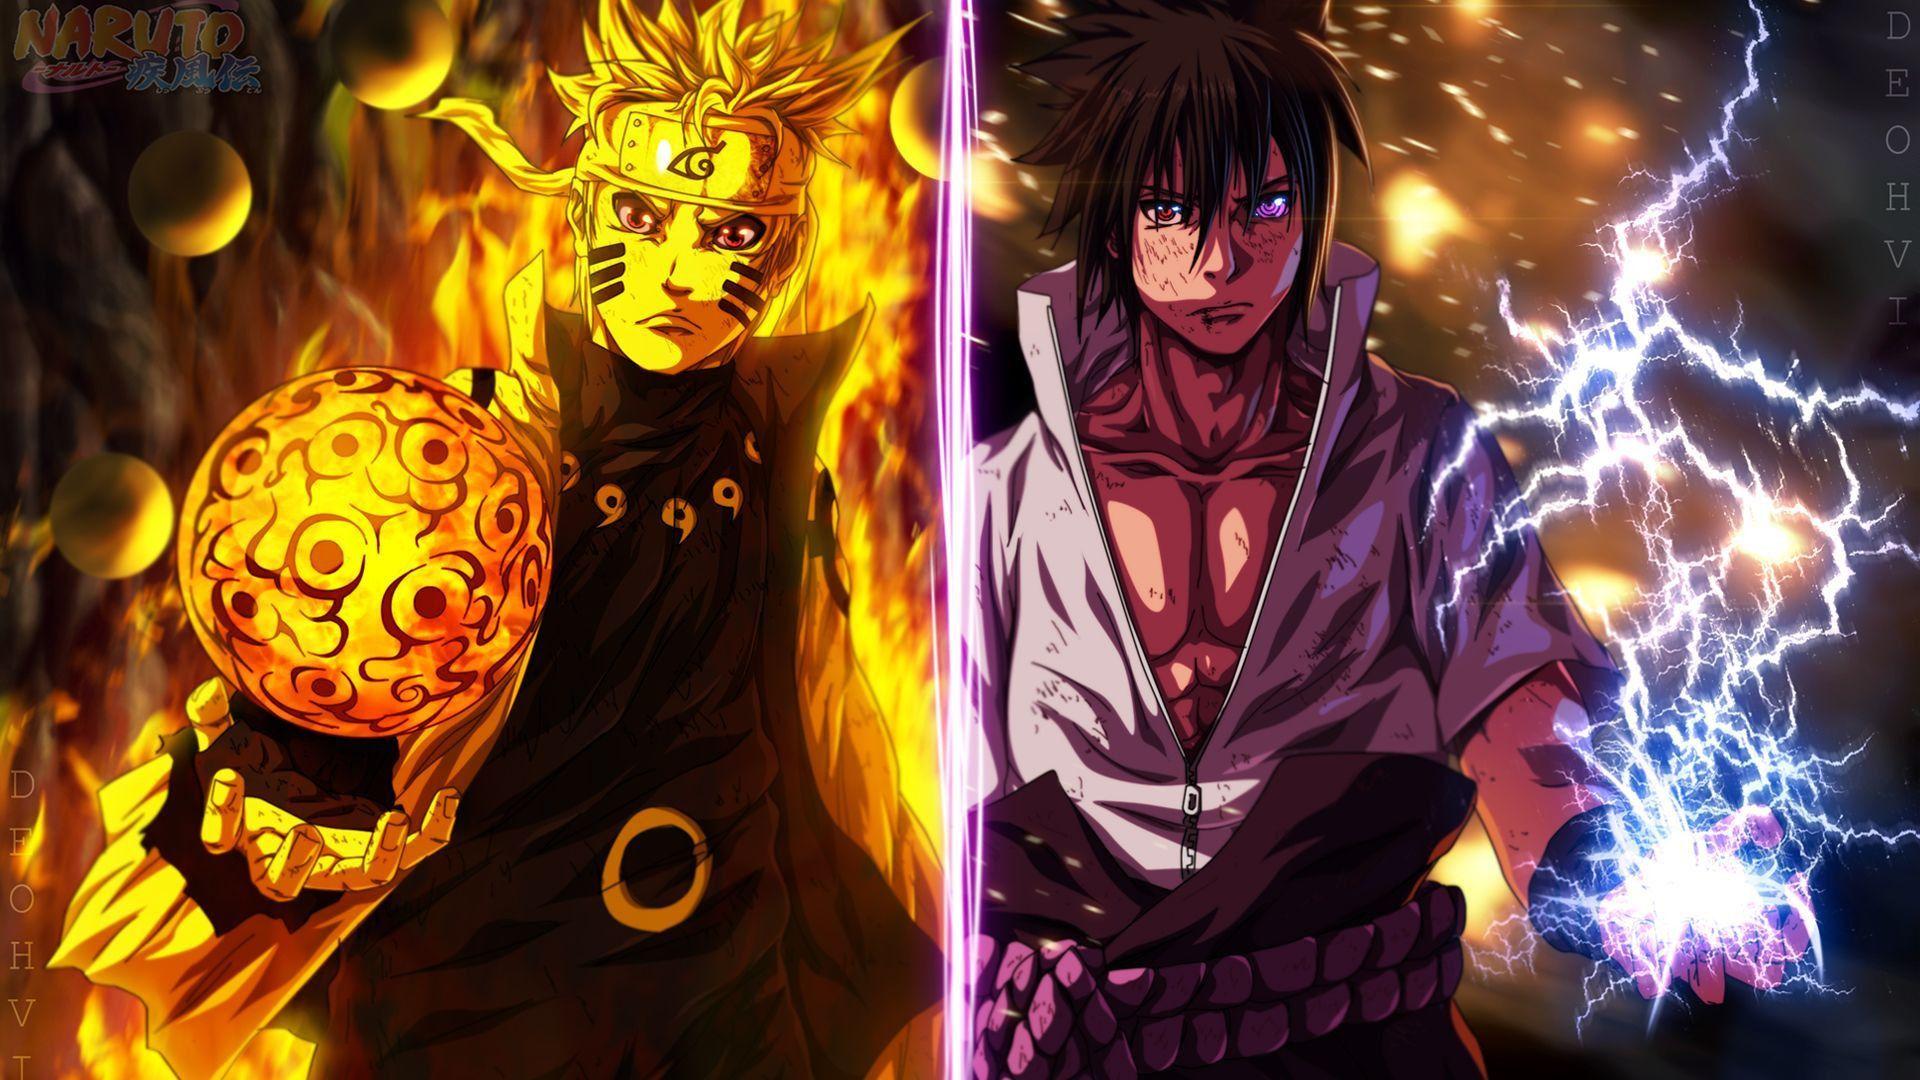 Fondos De Pantalla De Naruto Fondosmil